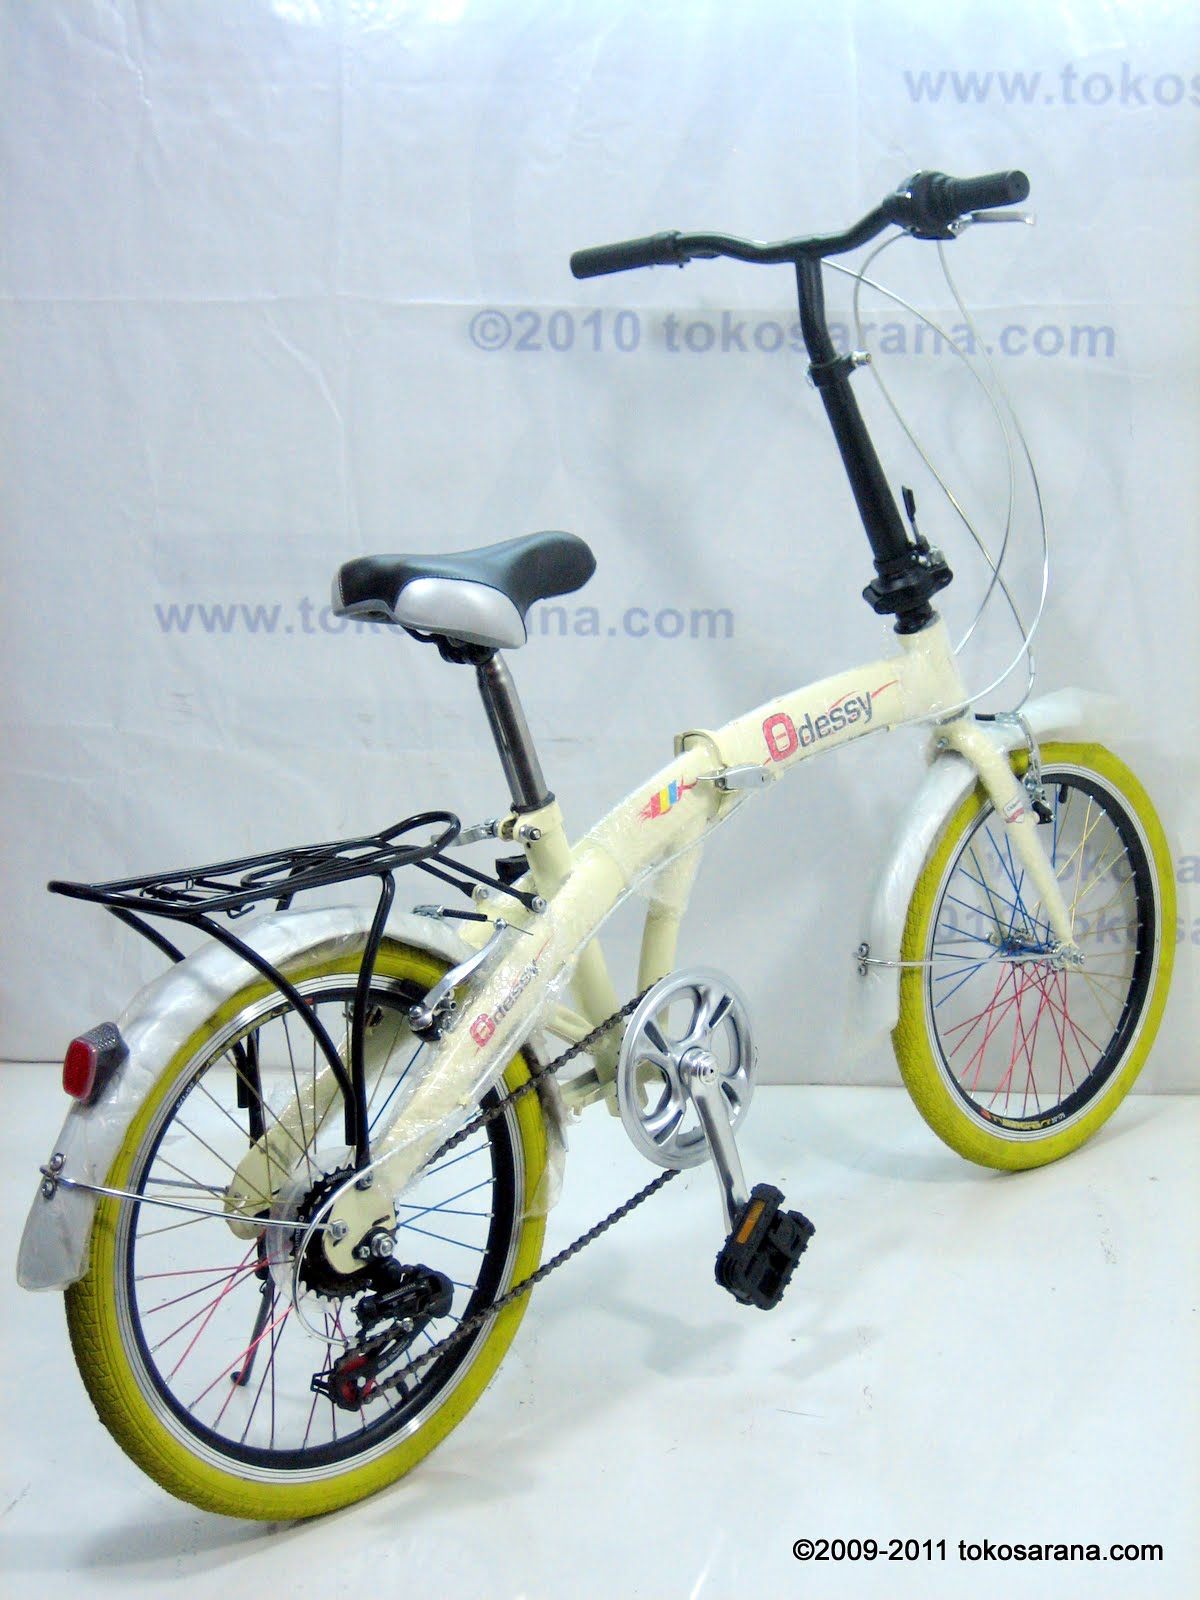 BINTANG HARAPAN: Sepeda Lipat ODESSY 6 Speed Shimano 20 Inci